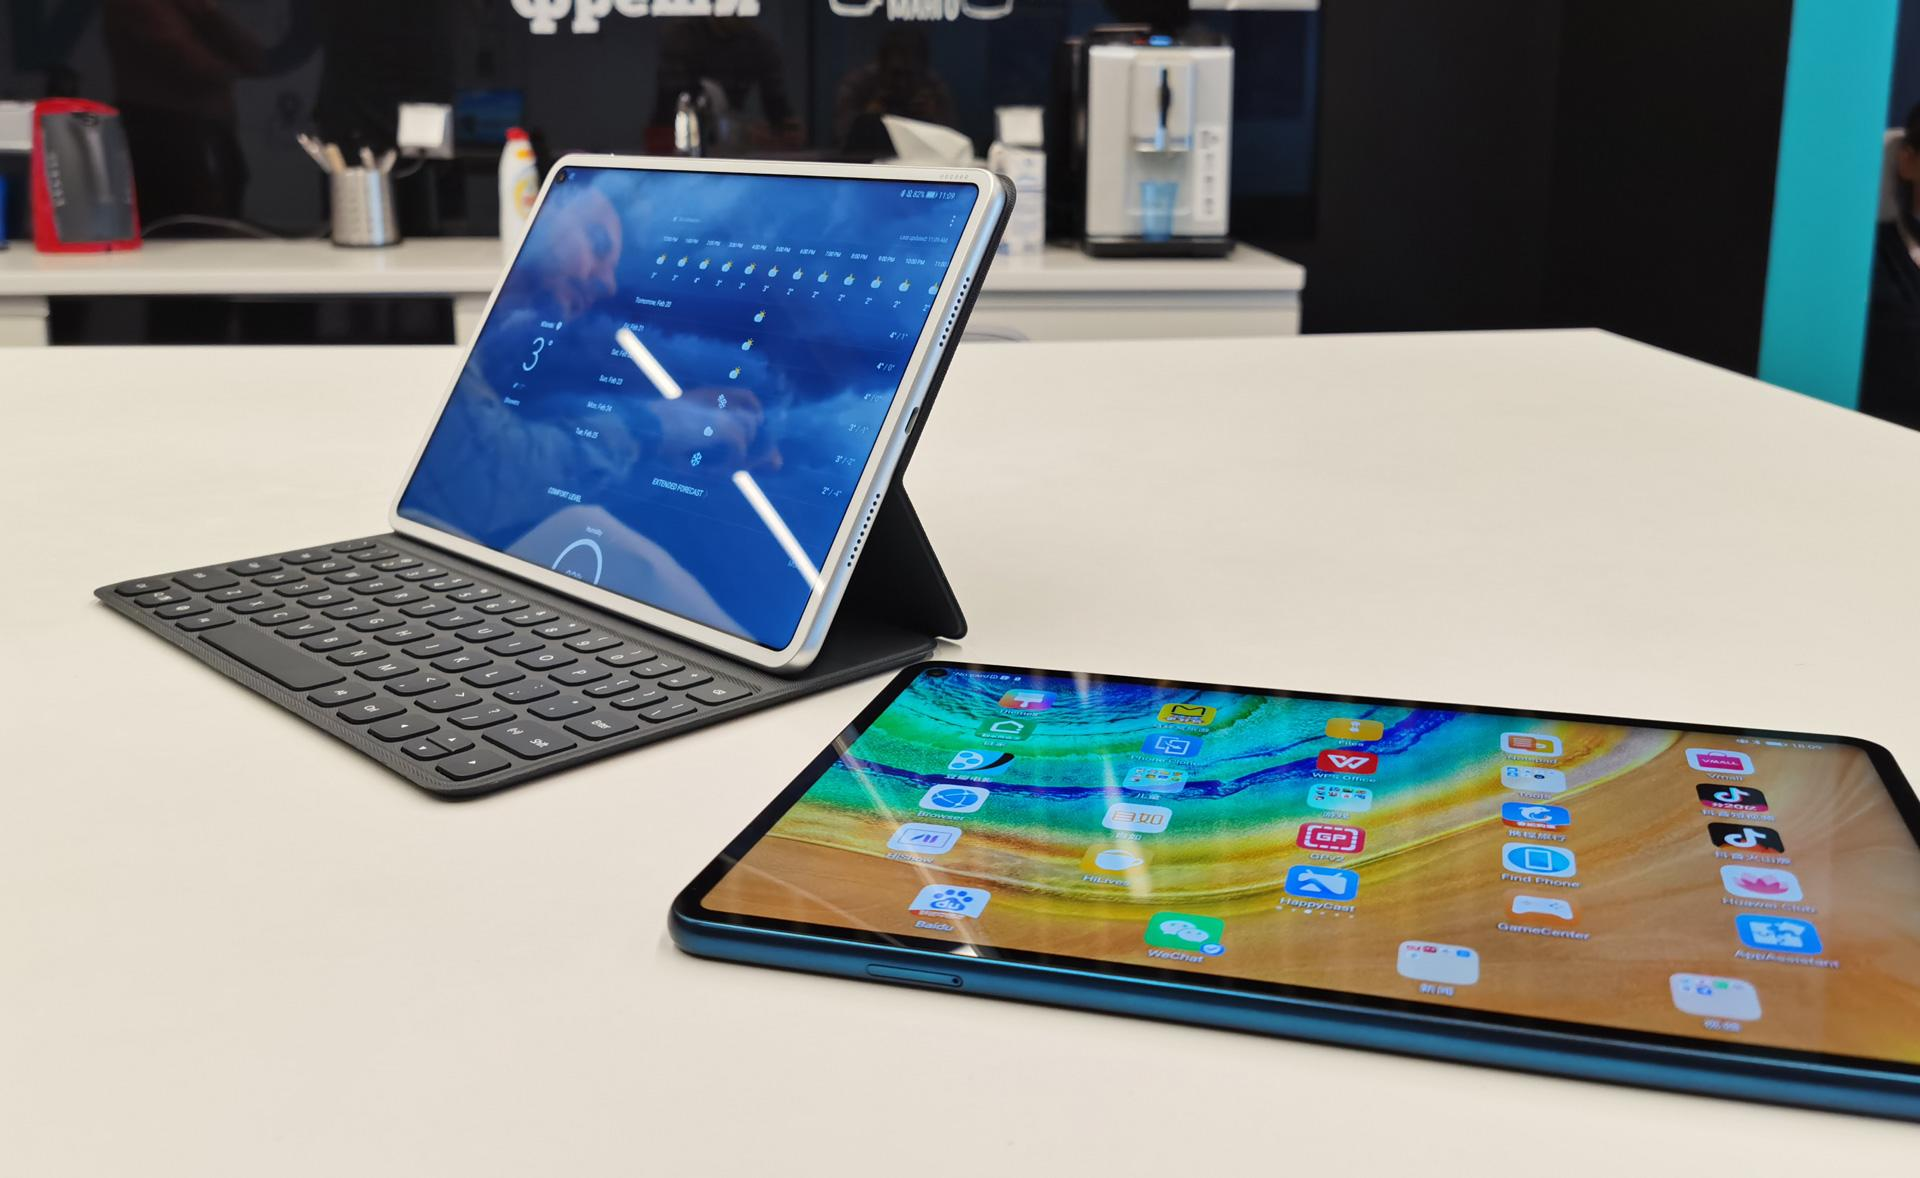 Обзор huawei pad pro: реальный конкурент ipad pro - gizchina.it